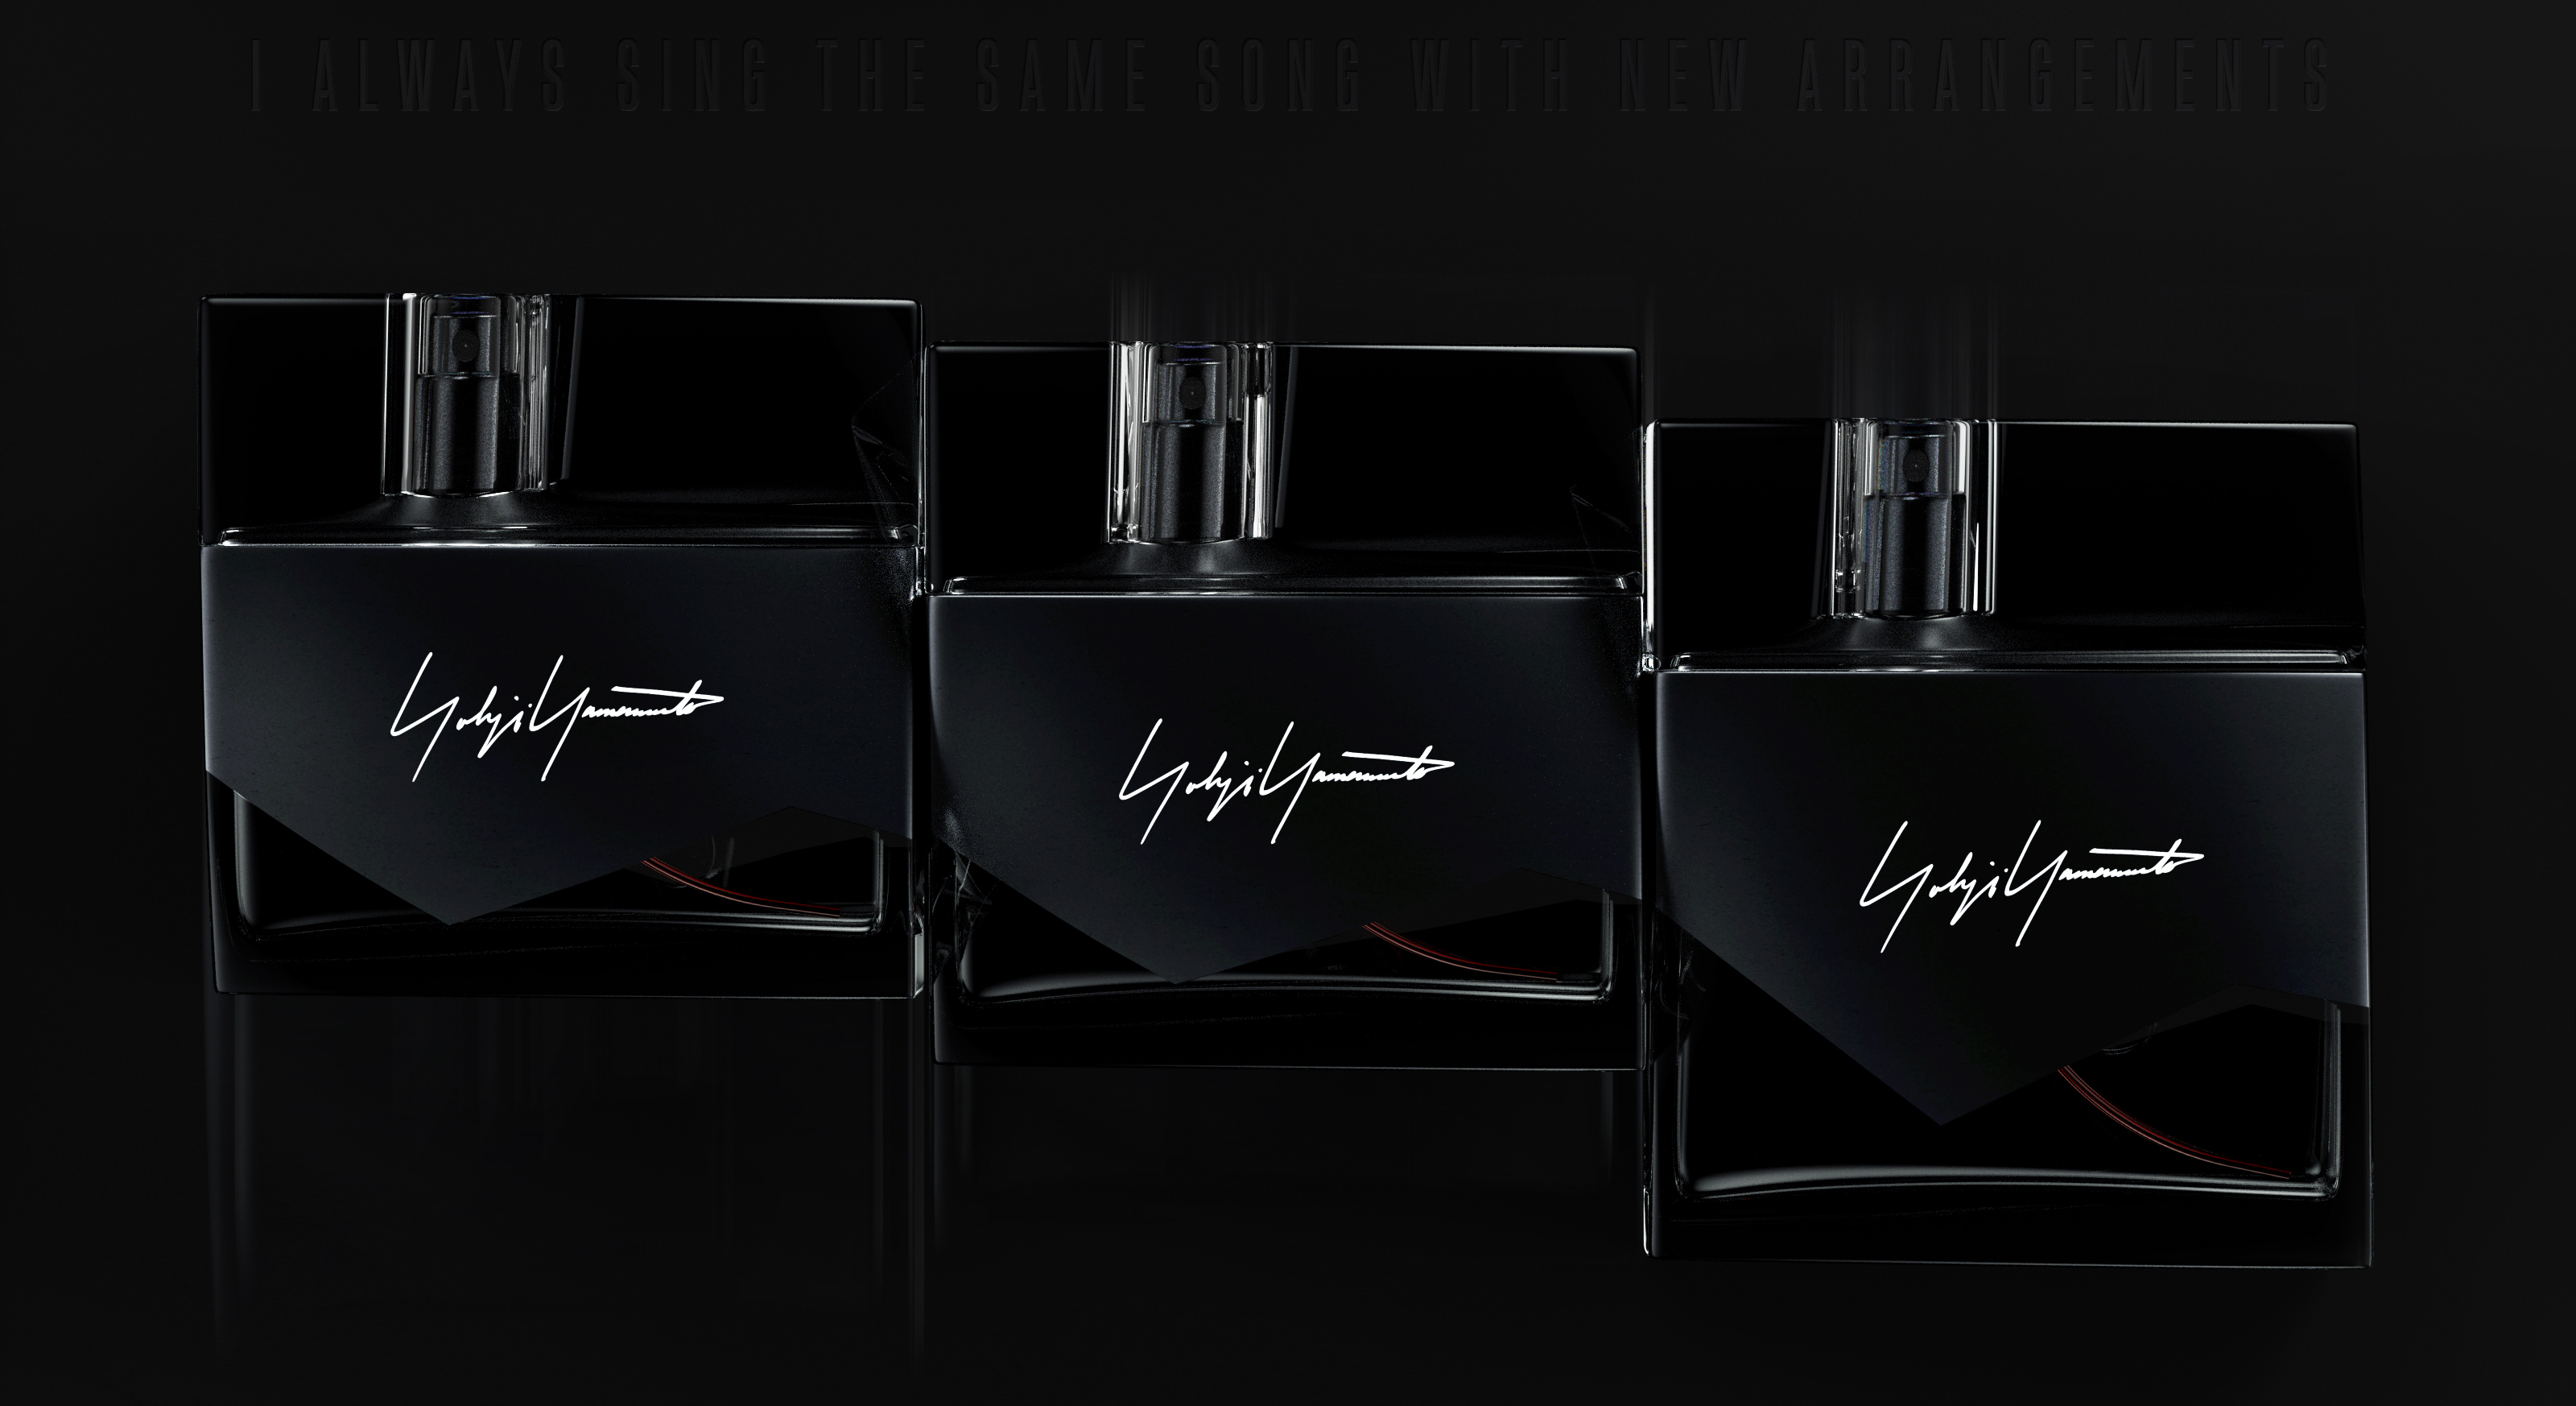 Yamamoto - perfume popular Japanese brand 86